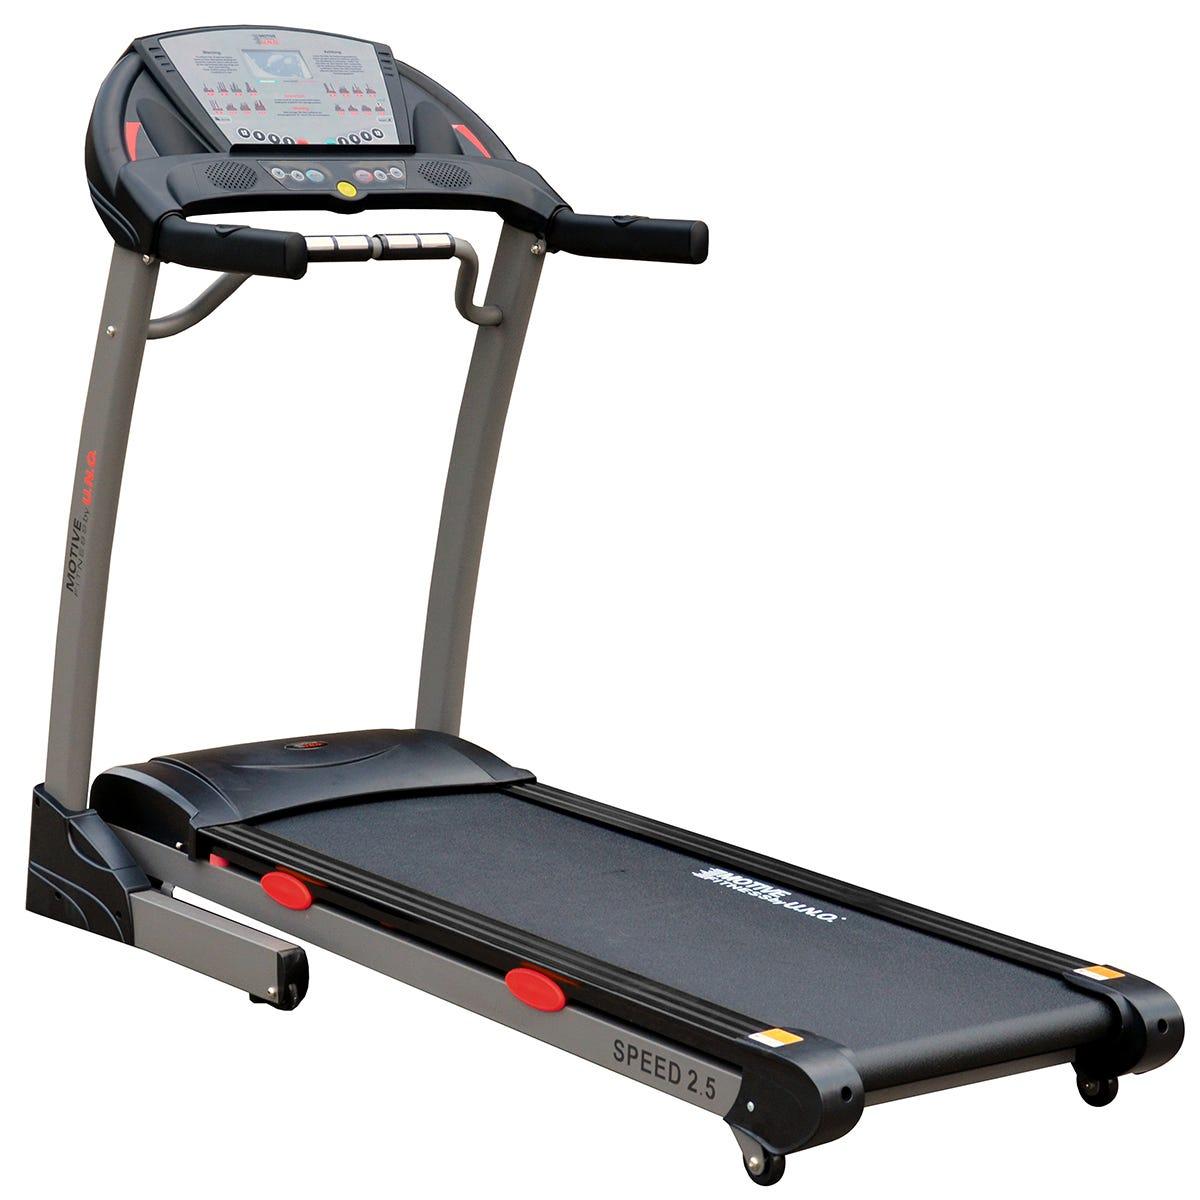 Motive Fitness MOTIVEfitness by UNO Speed 2.5 Programmable Power Incline Treadmill